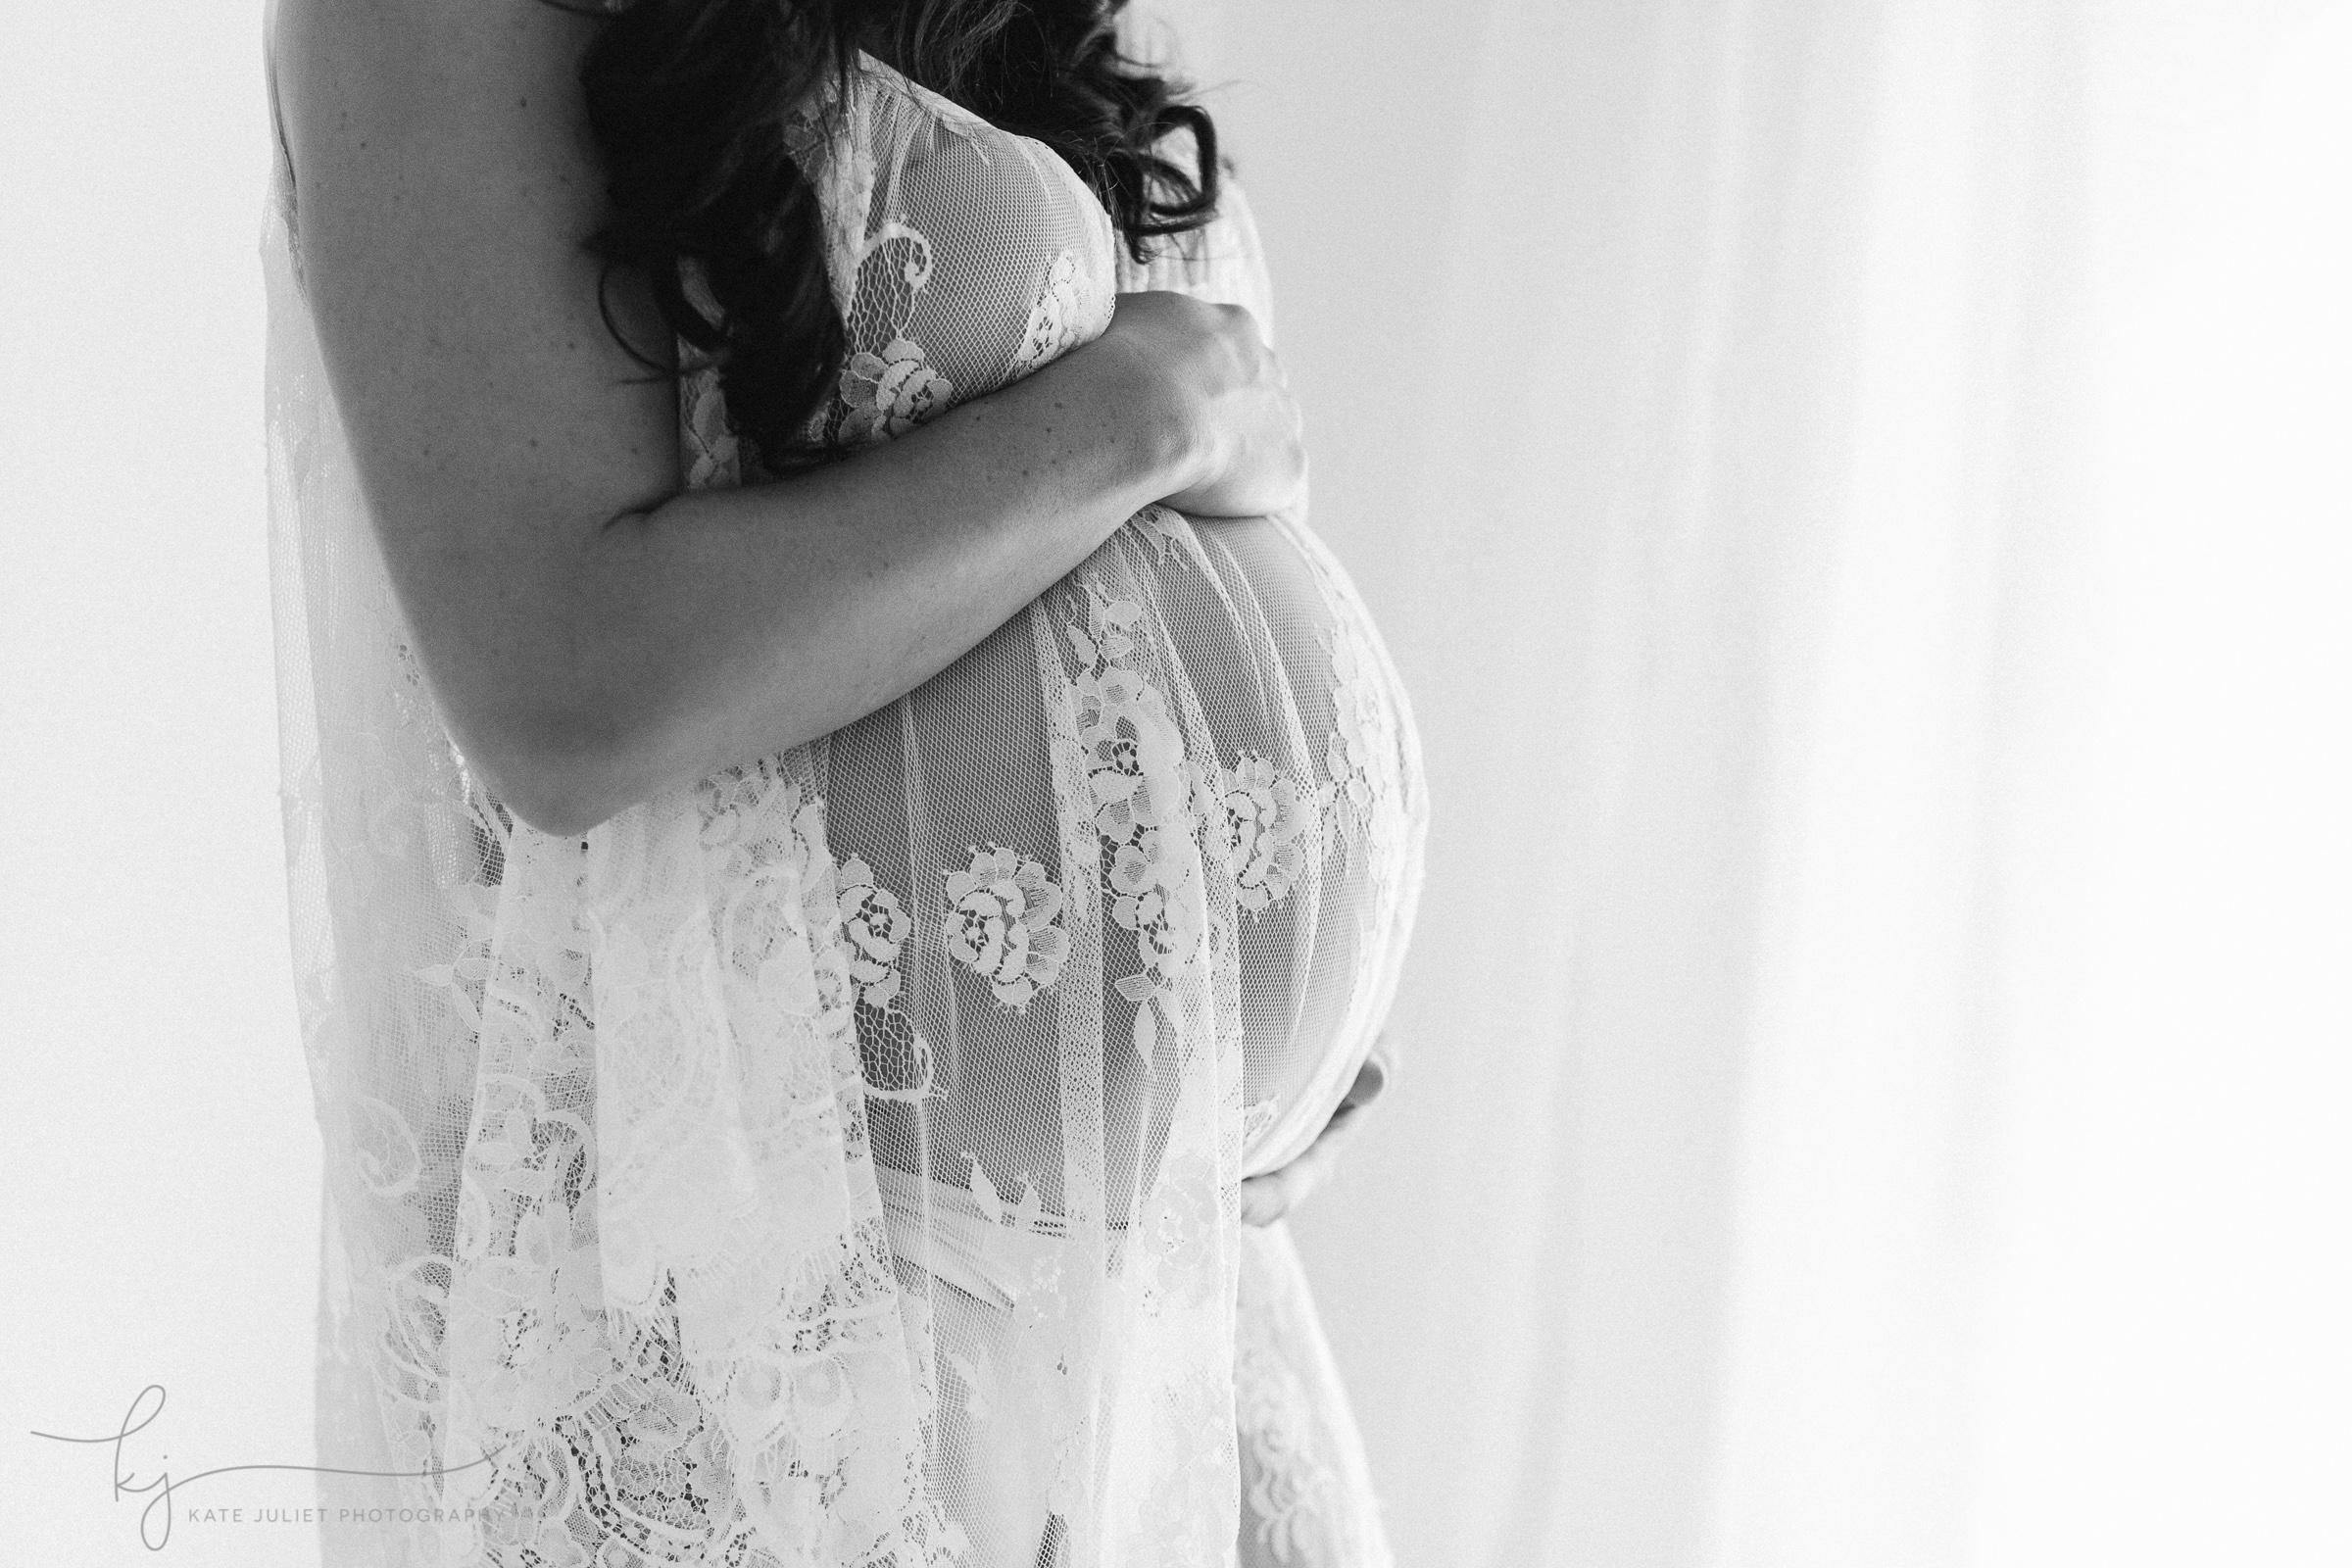 kate_juliet_photography_maternity_nova_rosell_web-006.jpg